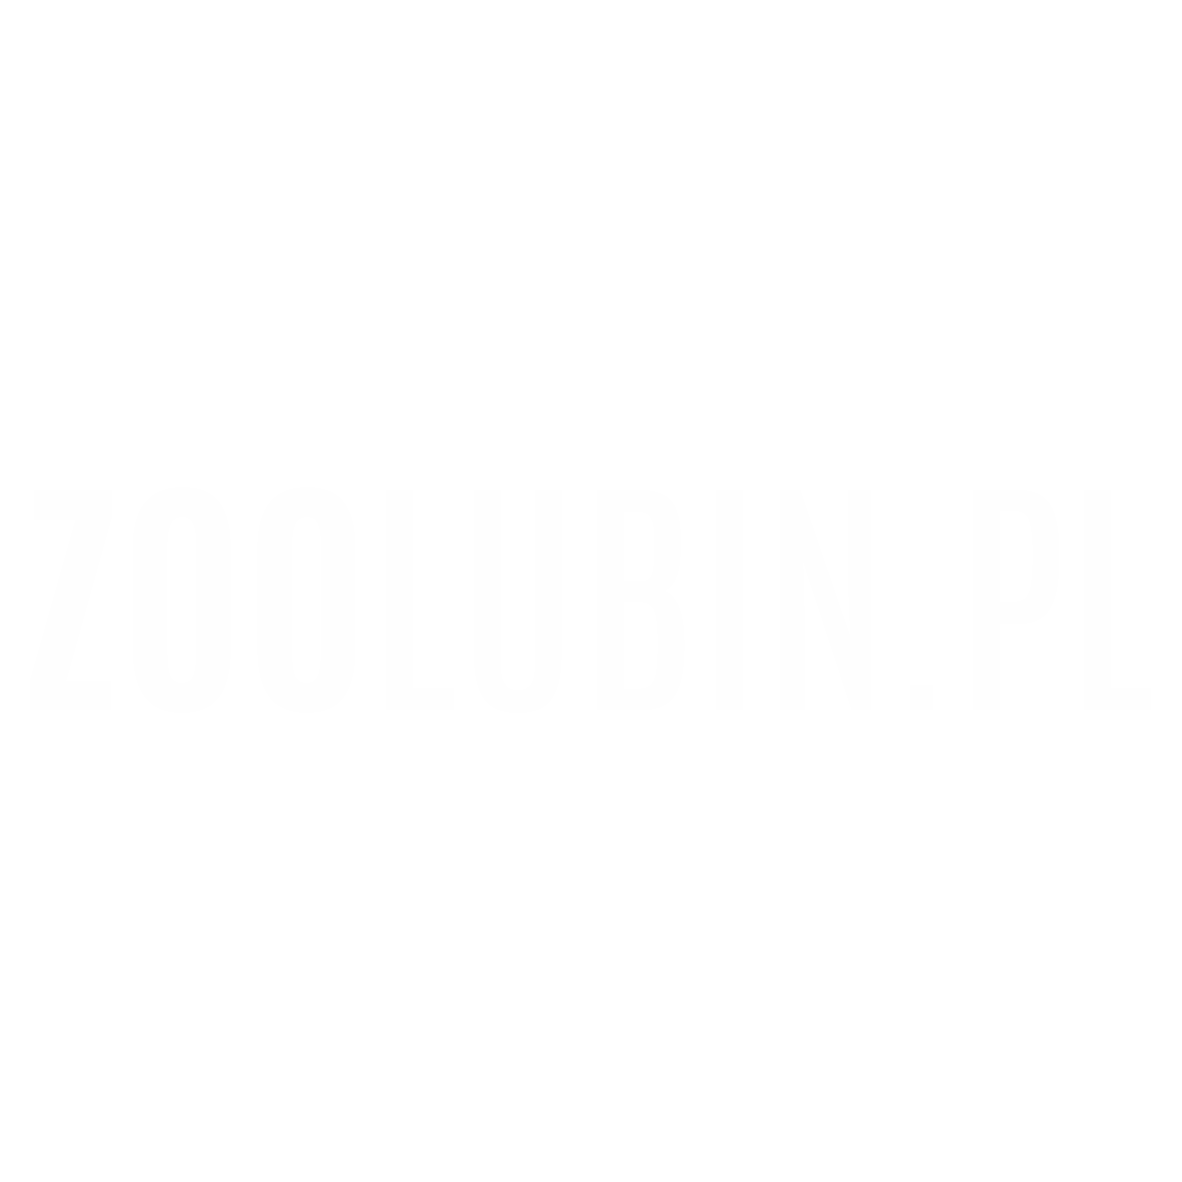 ZOOLUBIN.png